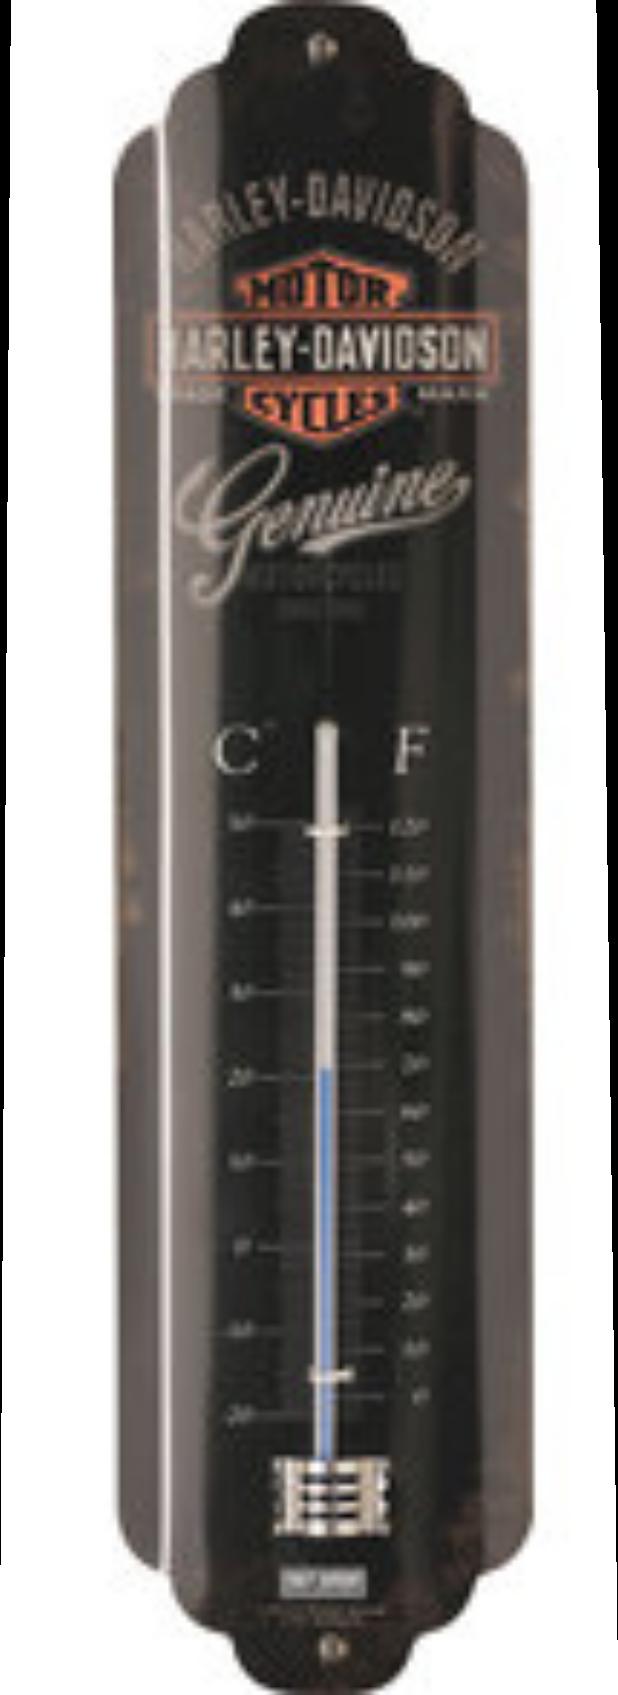 Thermomètre Harley Davidson noir